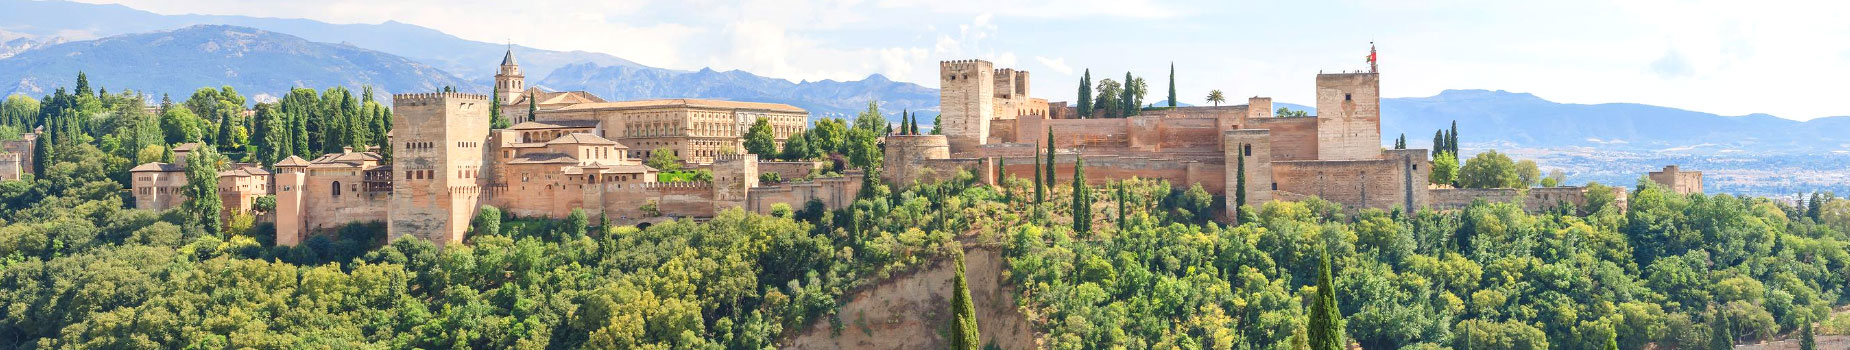 Vlieg busreis Andalusië